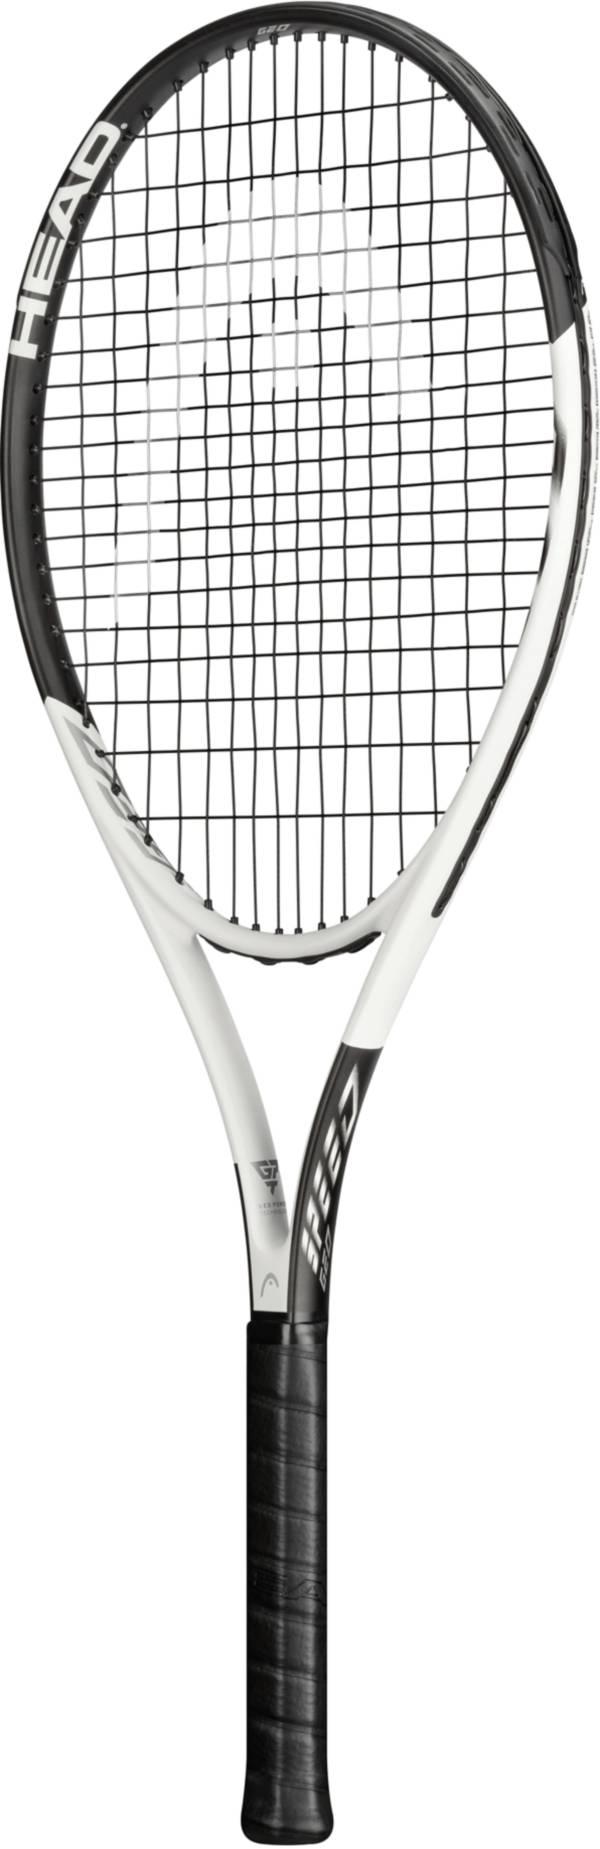 Head Geo Speed Tennis Racquet product image